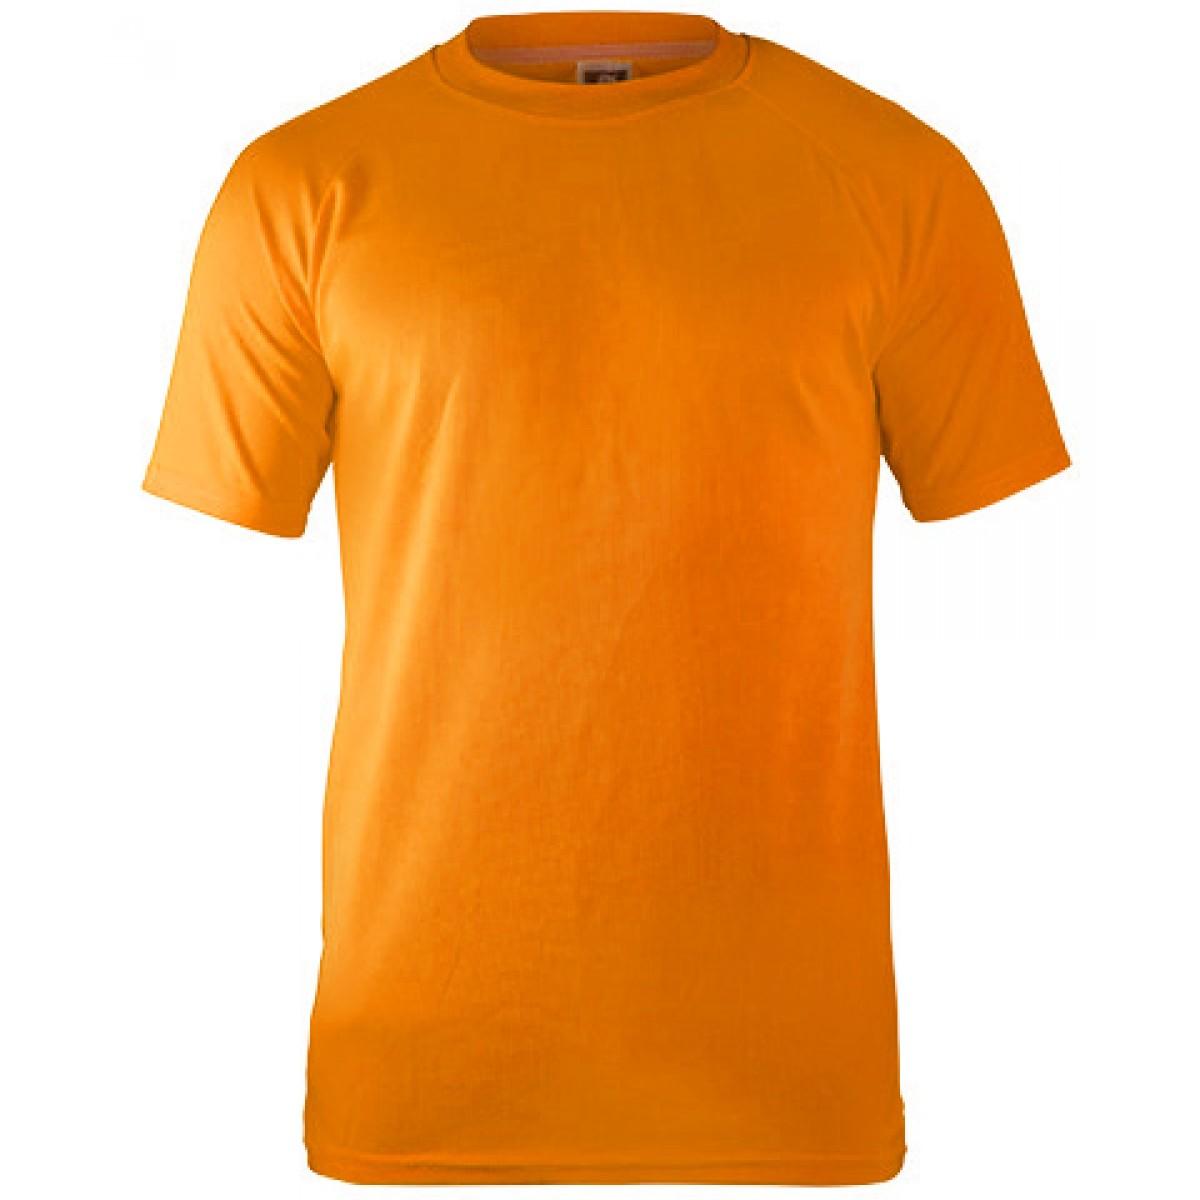 Short Sleeves Mesh Performance T-shirt-Safety Orange-S